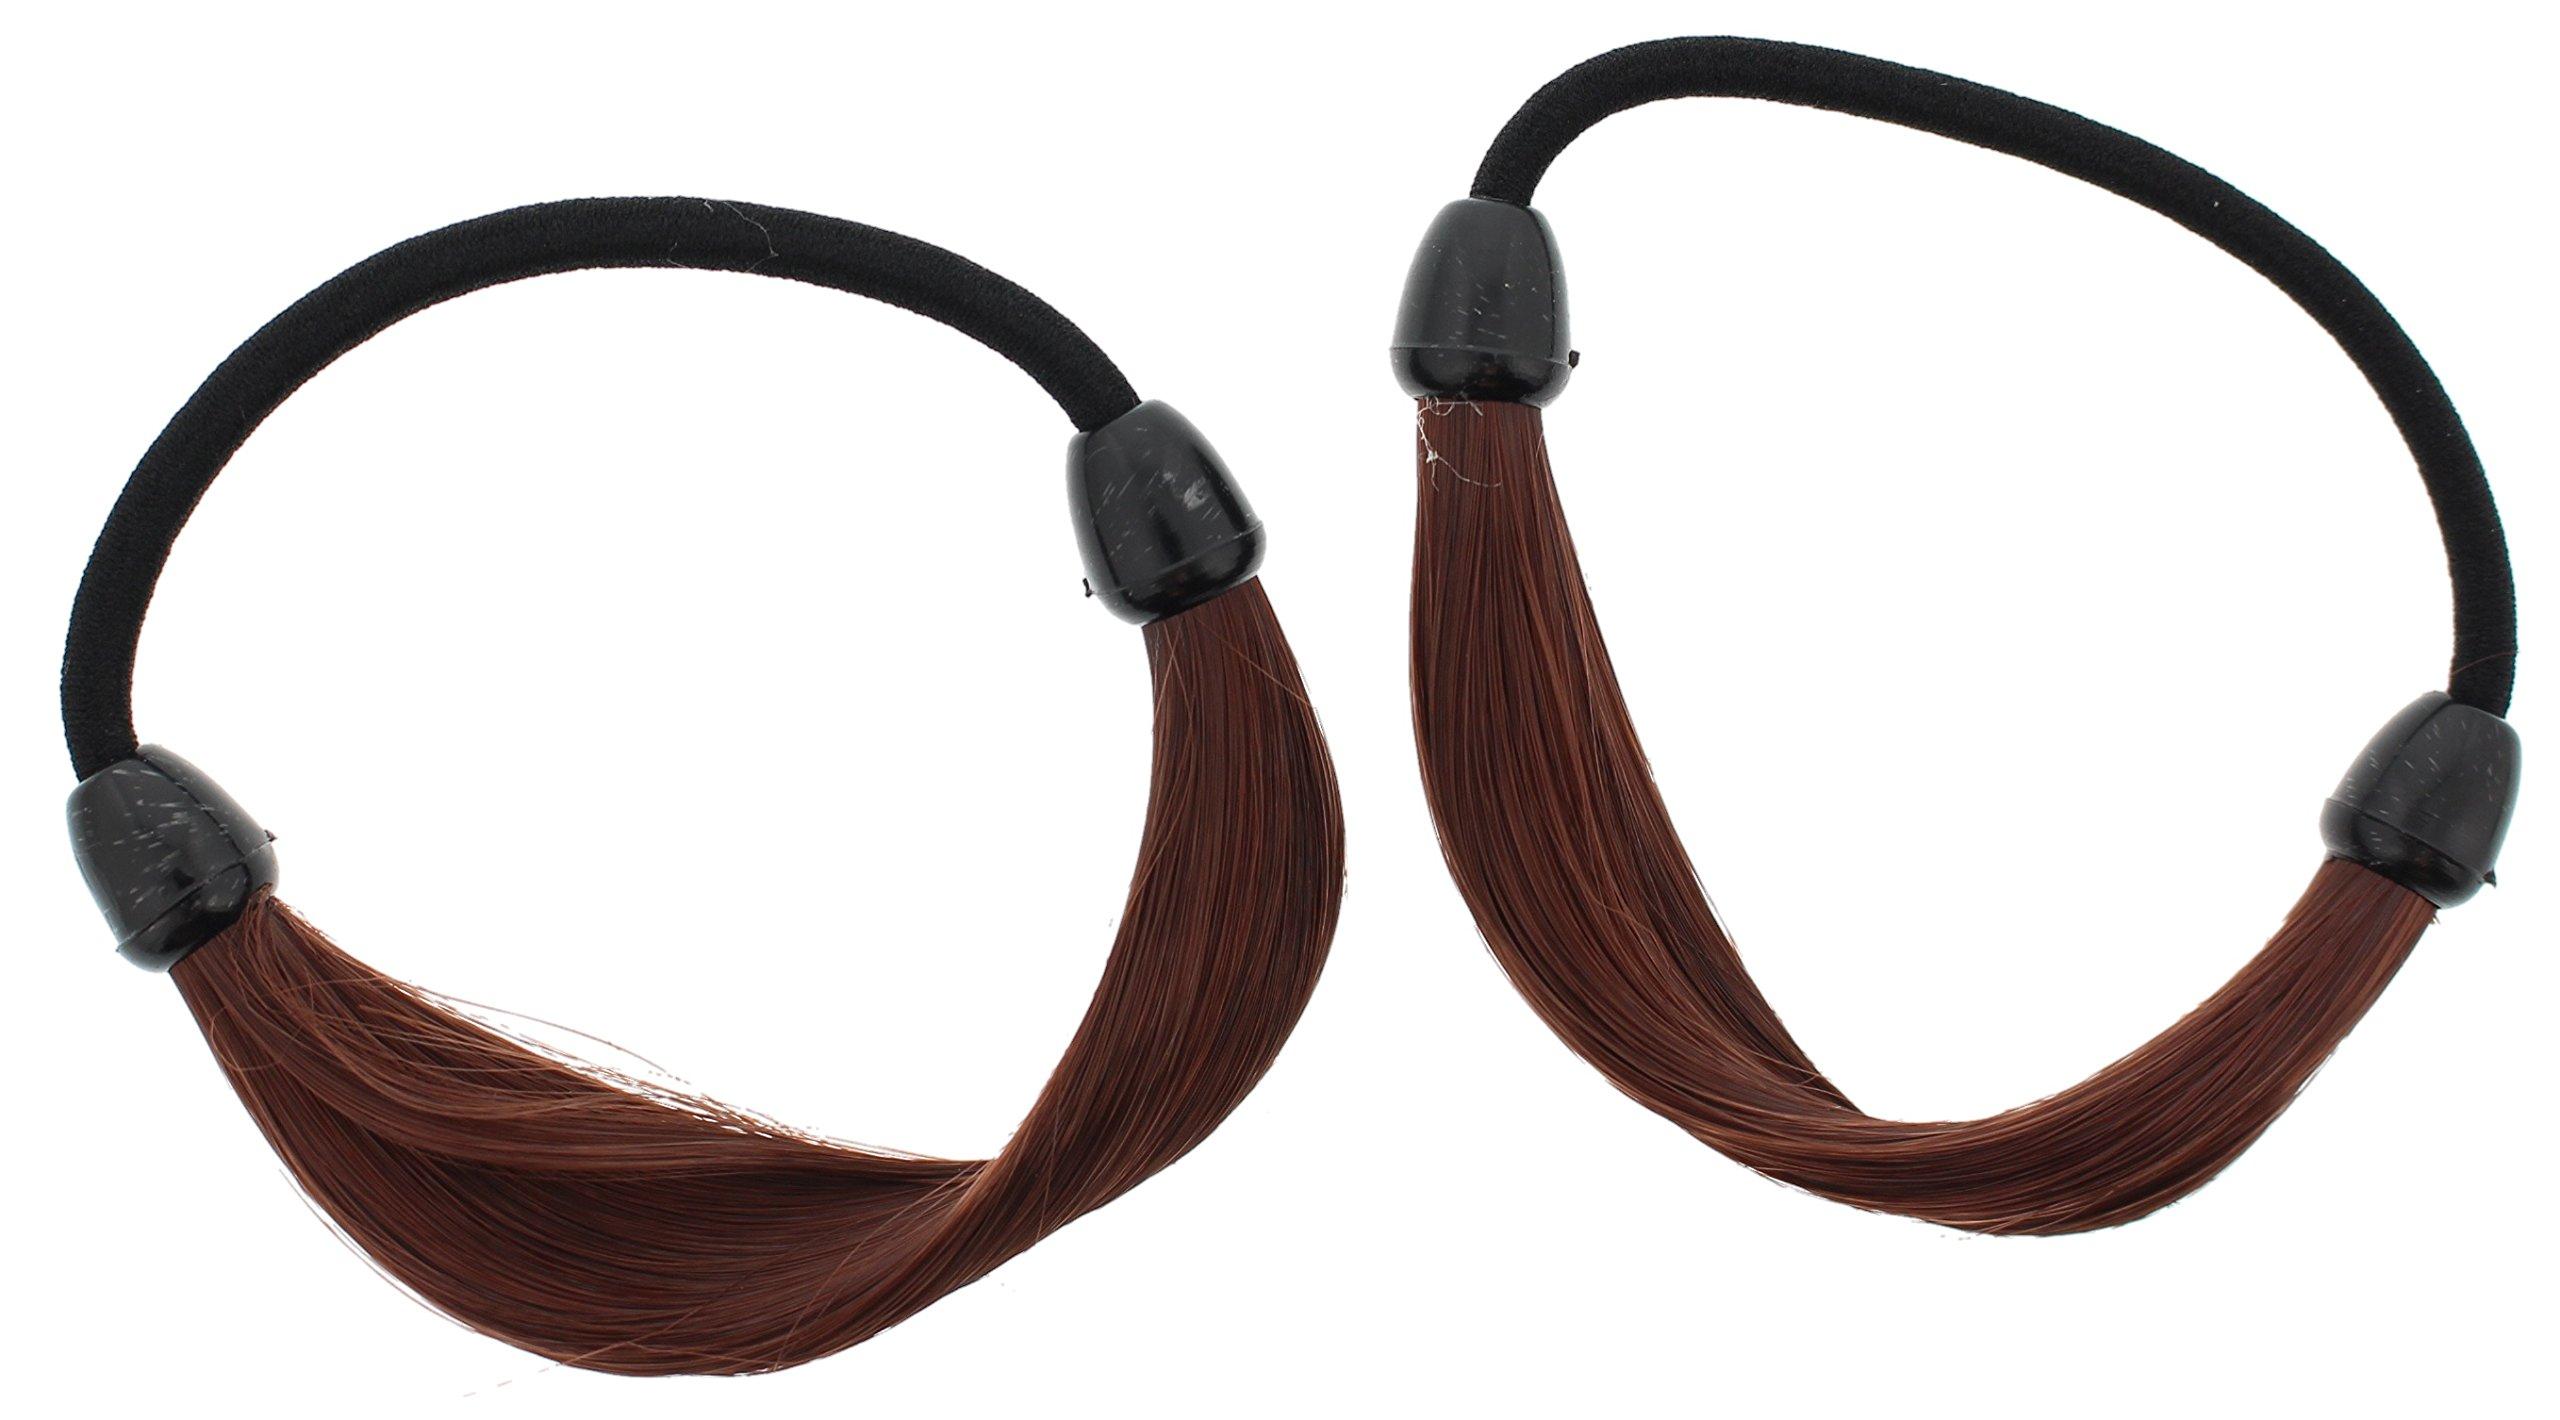 Making Waves Smooth Faux Hair Ponytail Holder (2Pcs) (Auburn)